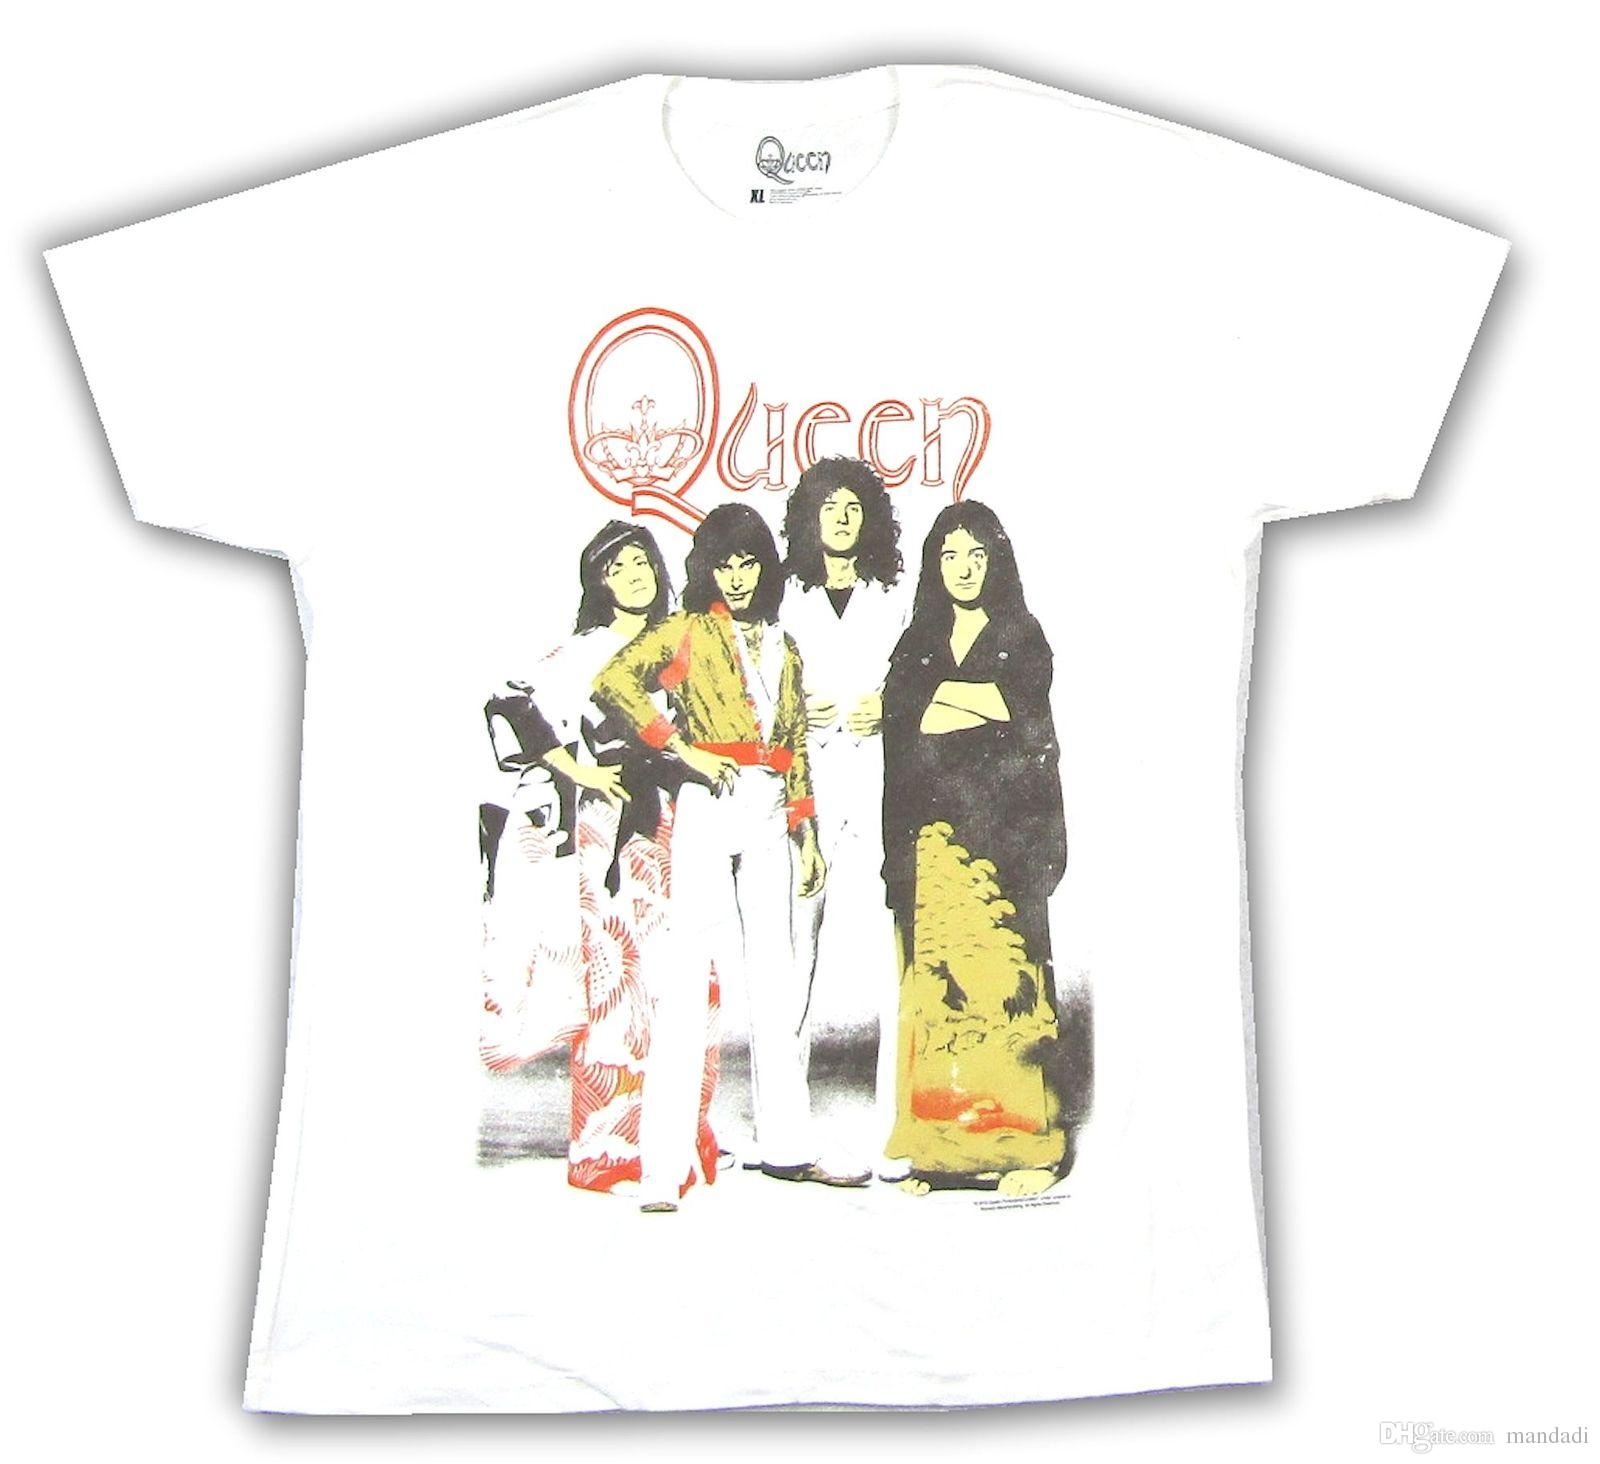 6191af5651a Queen Japanese Dress White T Shirt New Official Band Merch